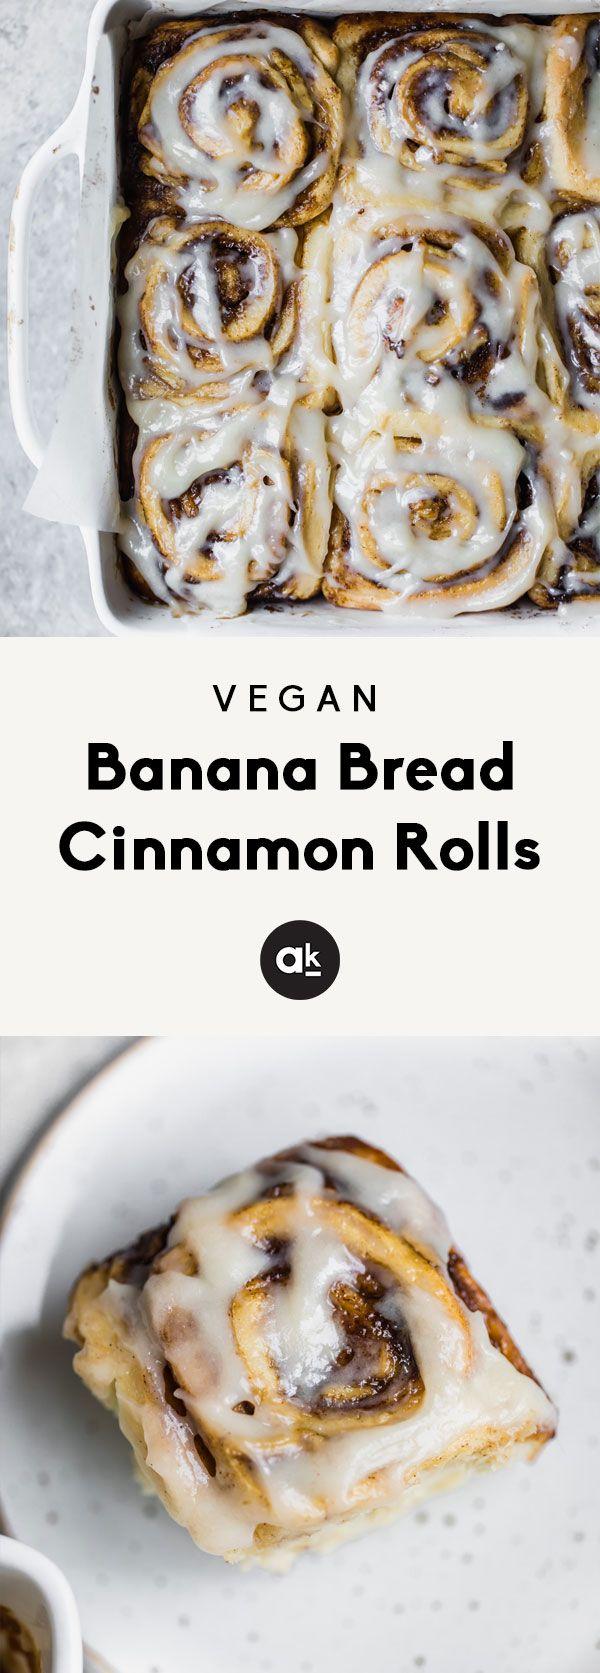 Vegan Banana Bread Cinnamon Rolls